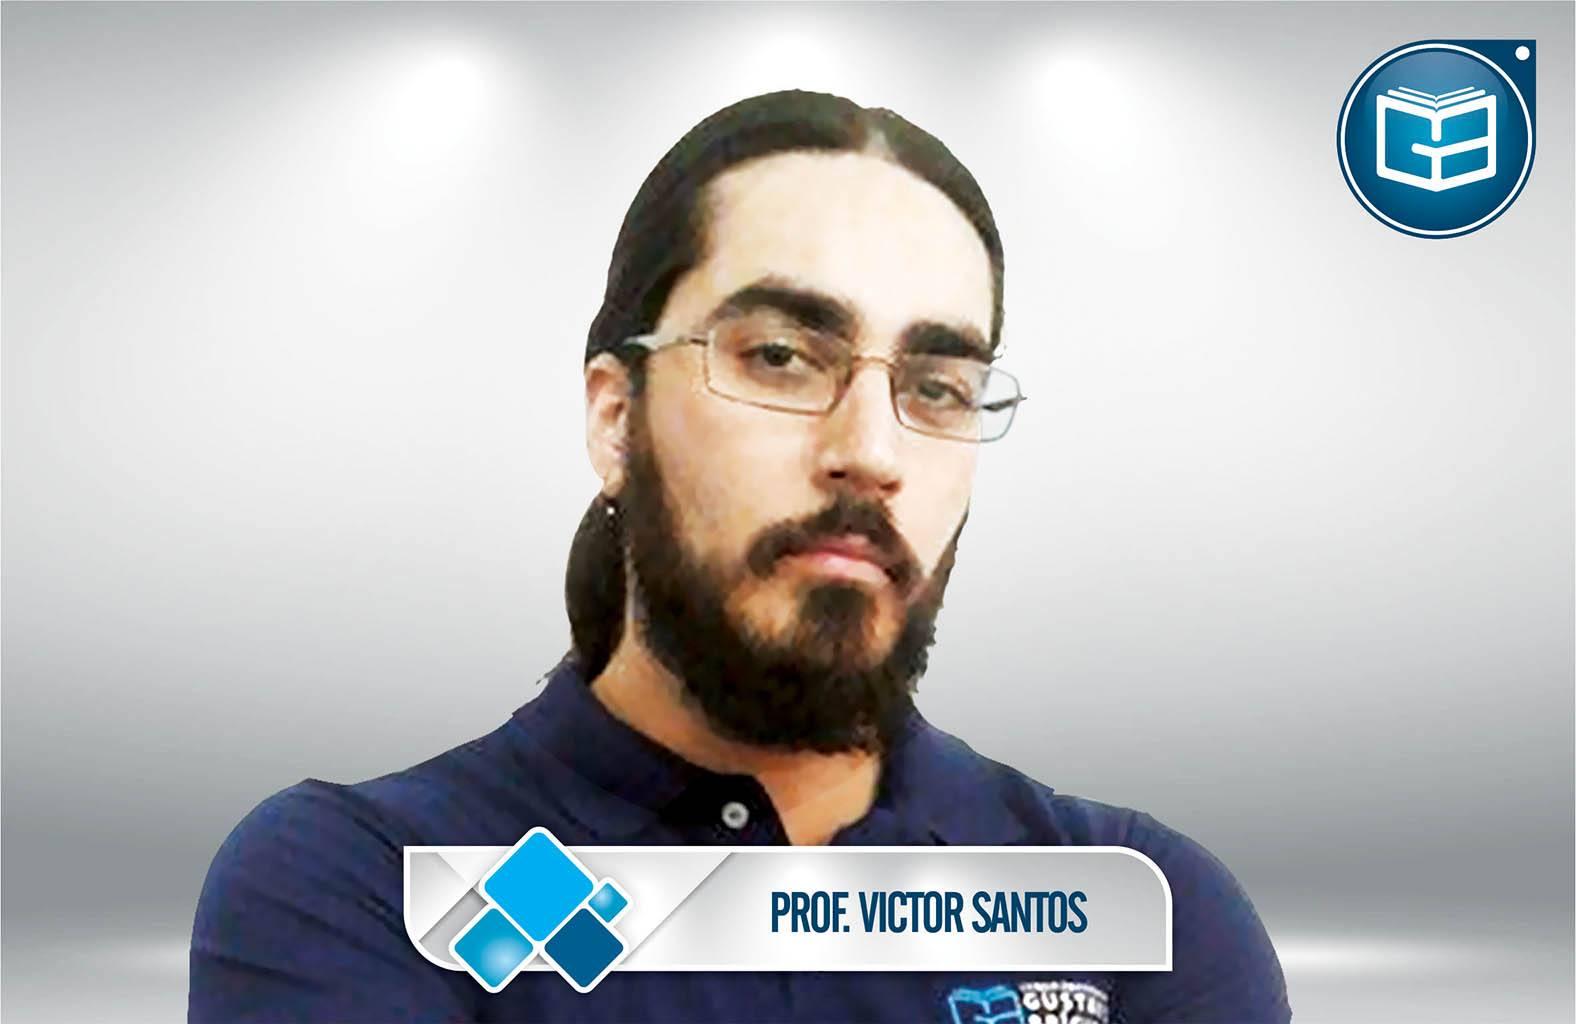 Pacote Anticrime - Professor Victor Santos